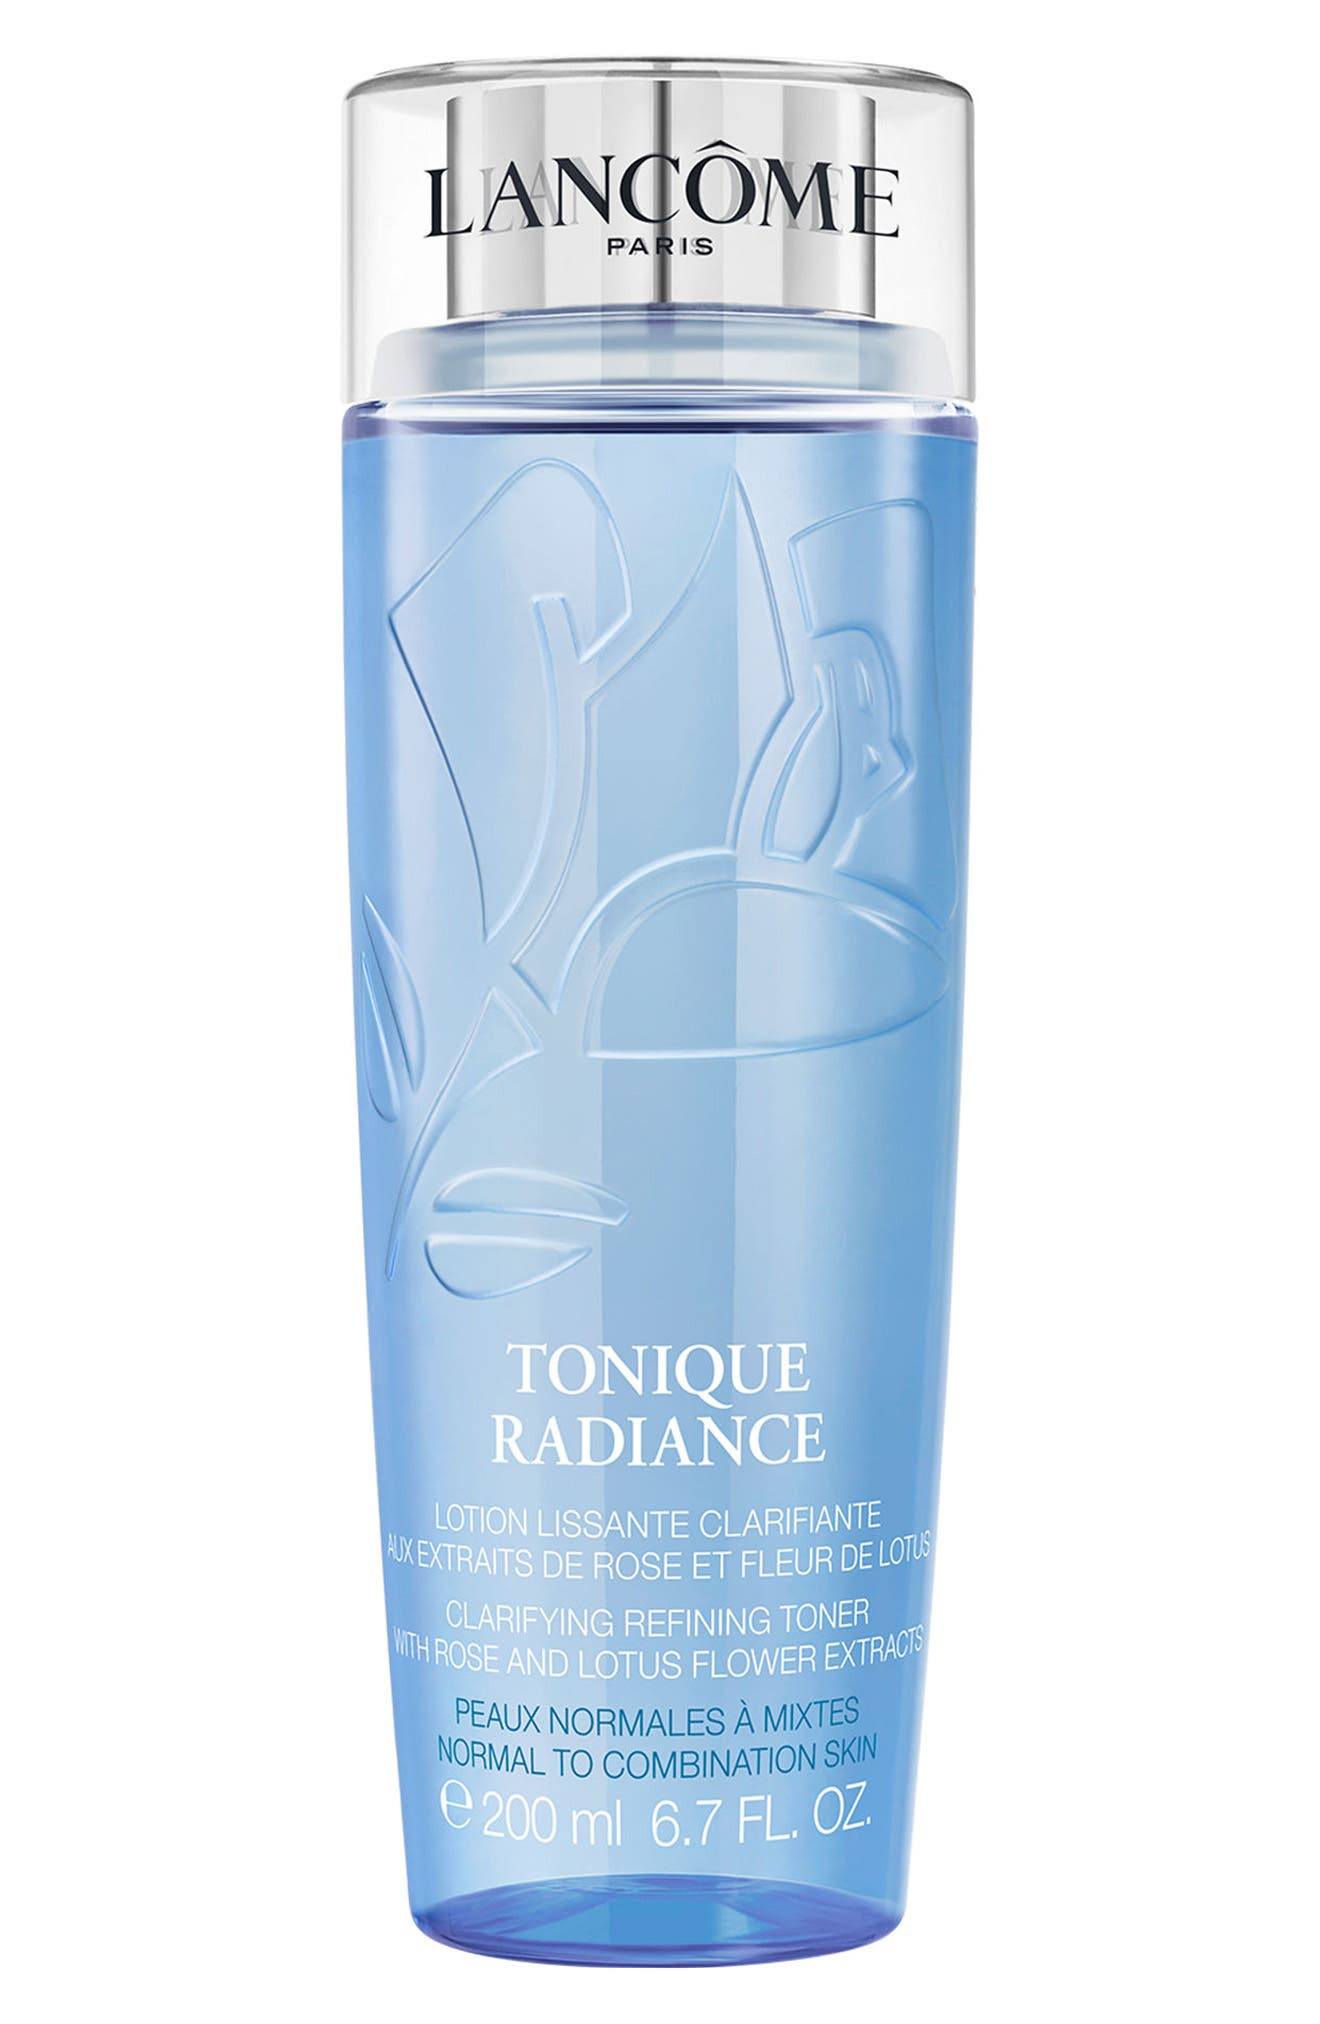 Lancôme Tonique Radiance Clarifying Exfoliating Toner (6.8 oz.)